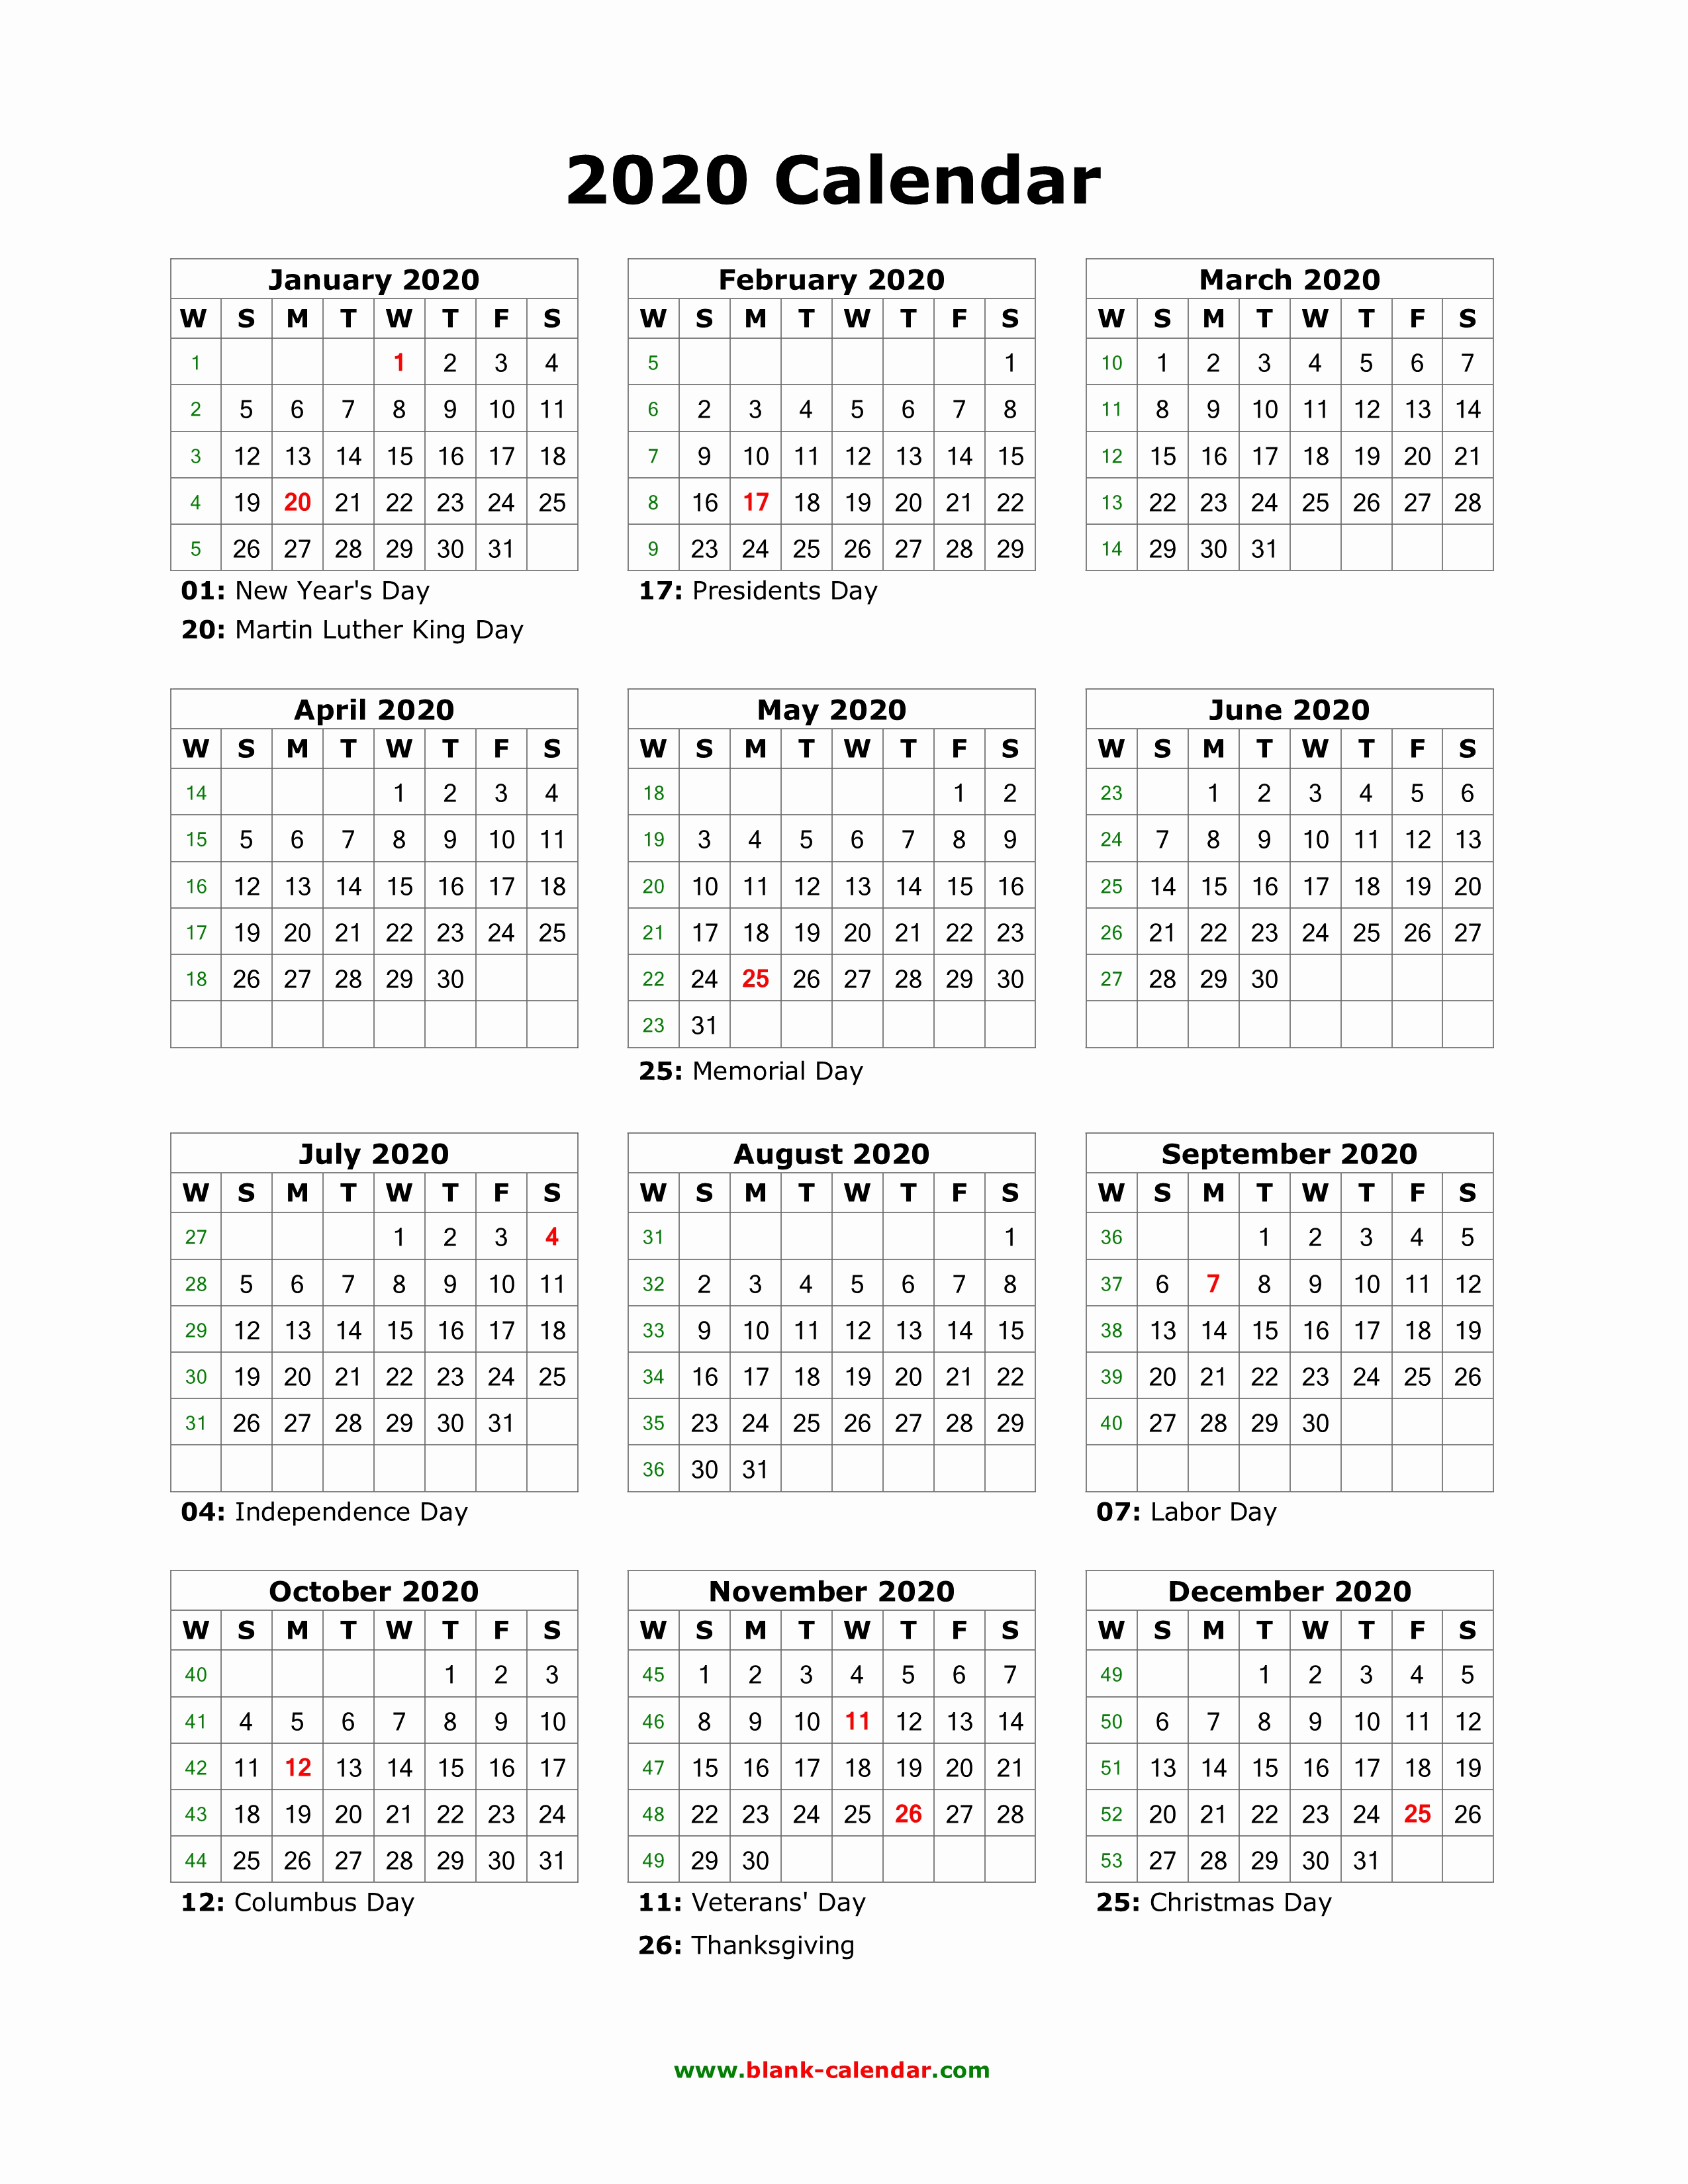 2015 Free Attendance Calendars Printable Employee Attendance